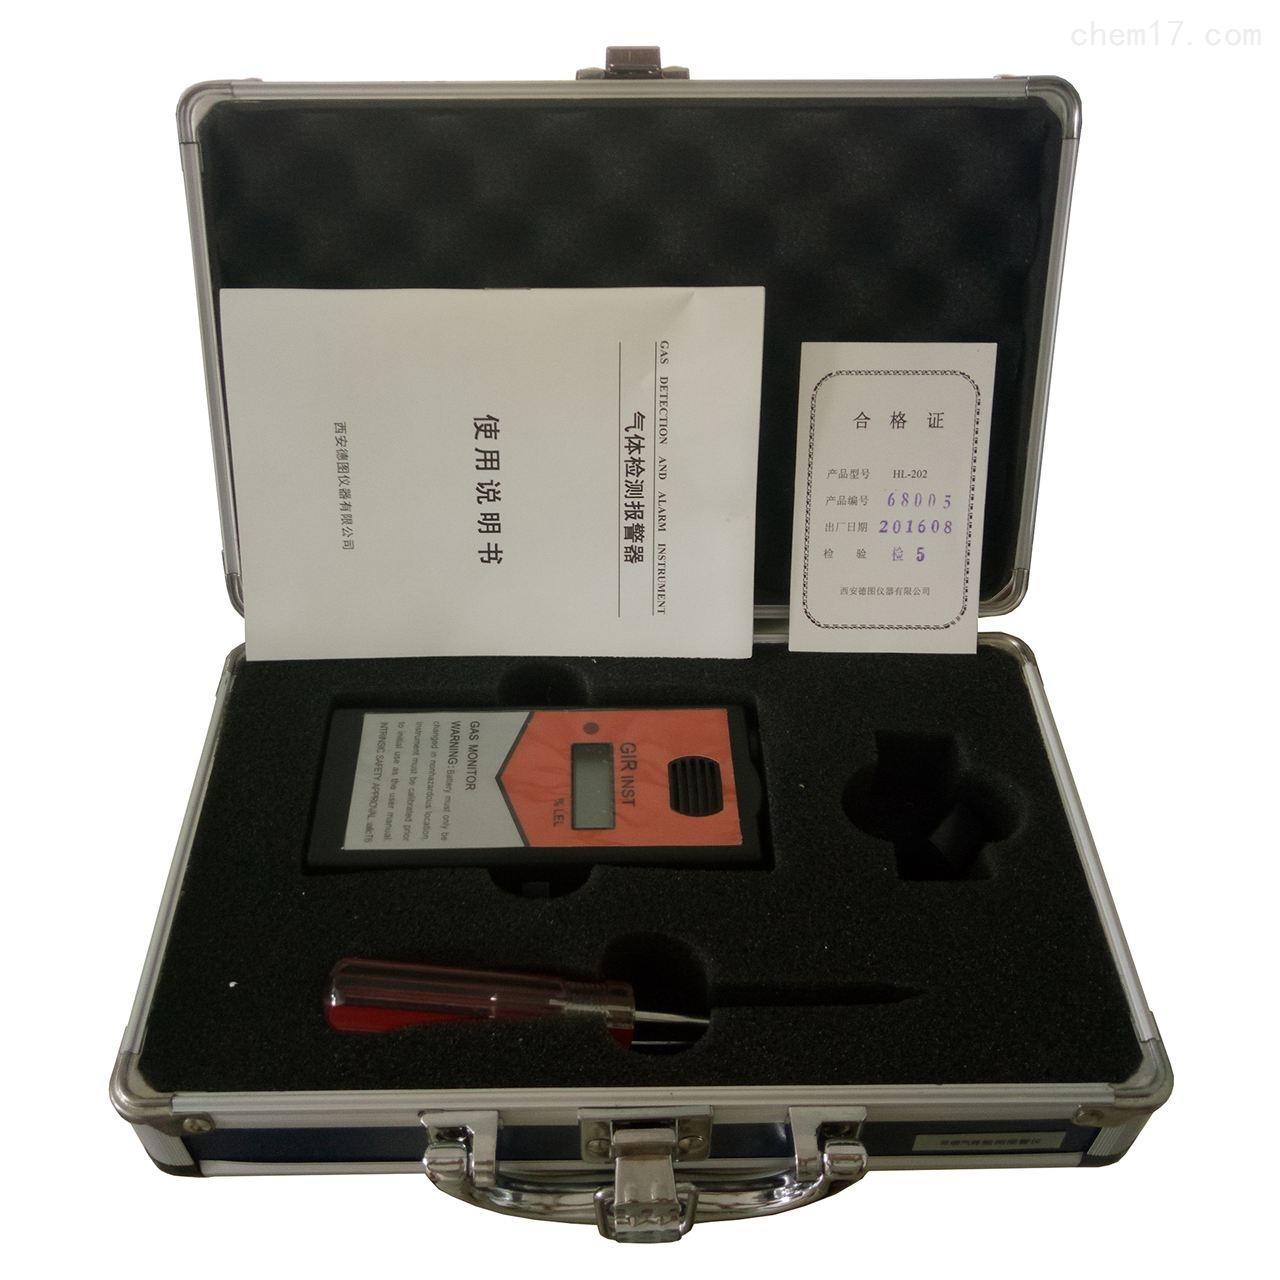 HL-202可燃气体报警仪  可燃气体检测仪